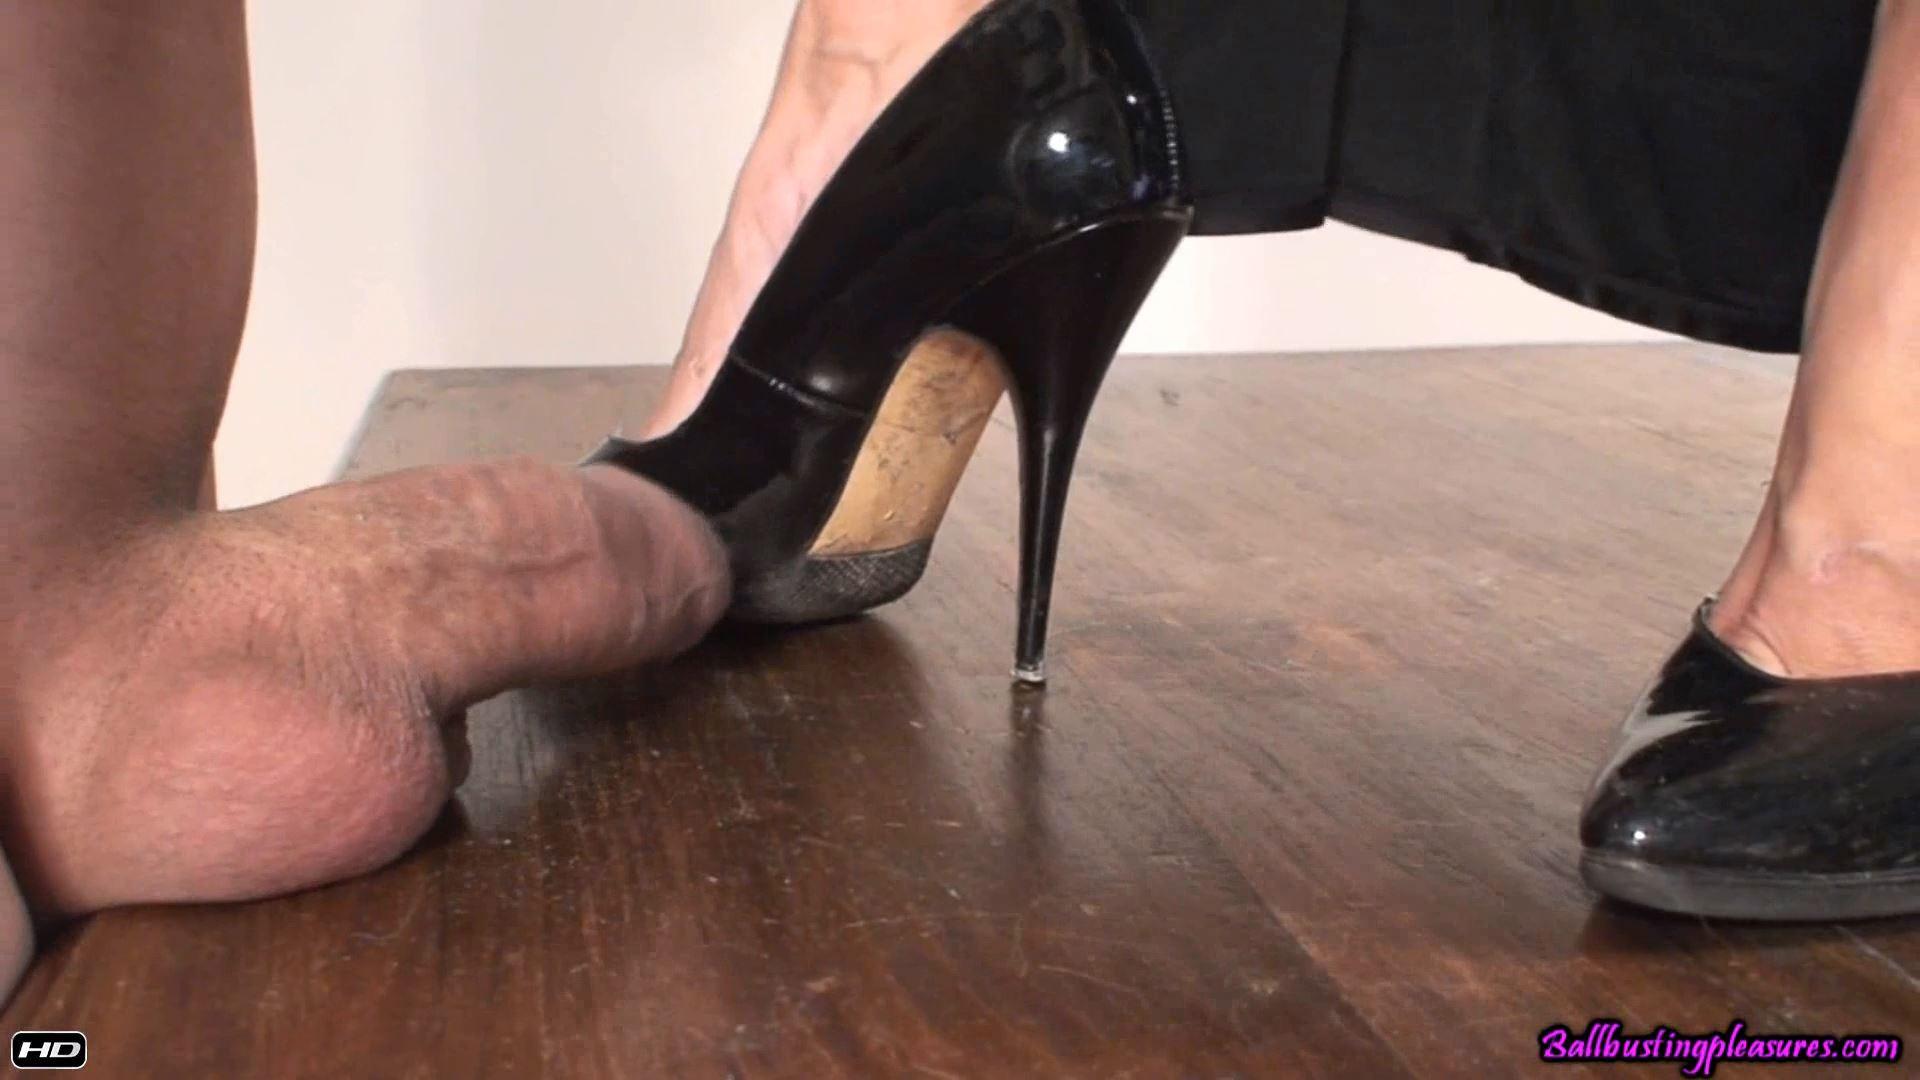 Goddess Carmen In Scene: Cock Crush - BALLBUSTINGPLEASURES - FULL HD/1080p/MP4